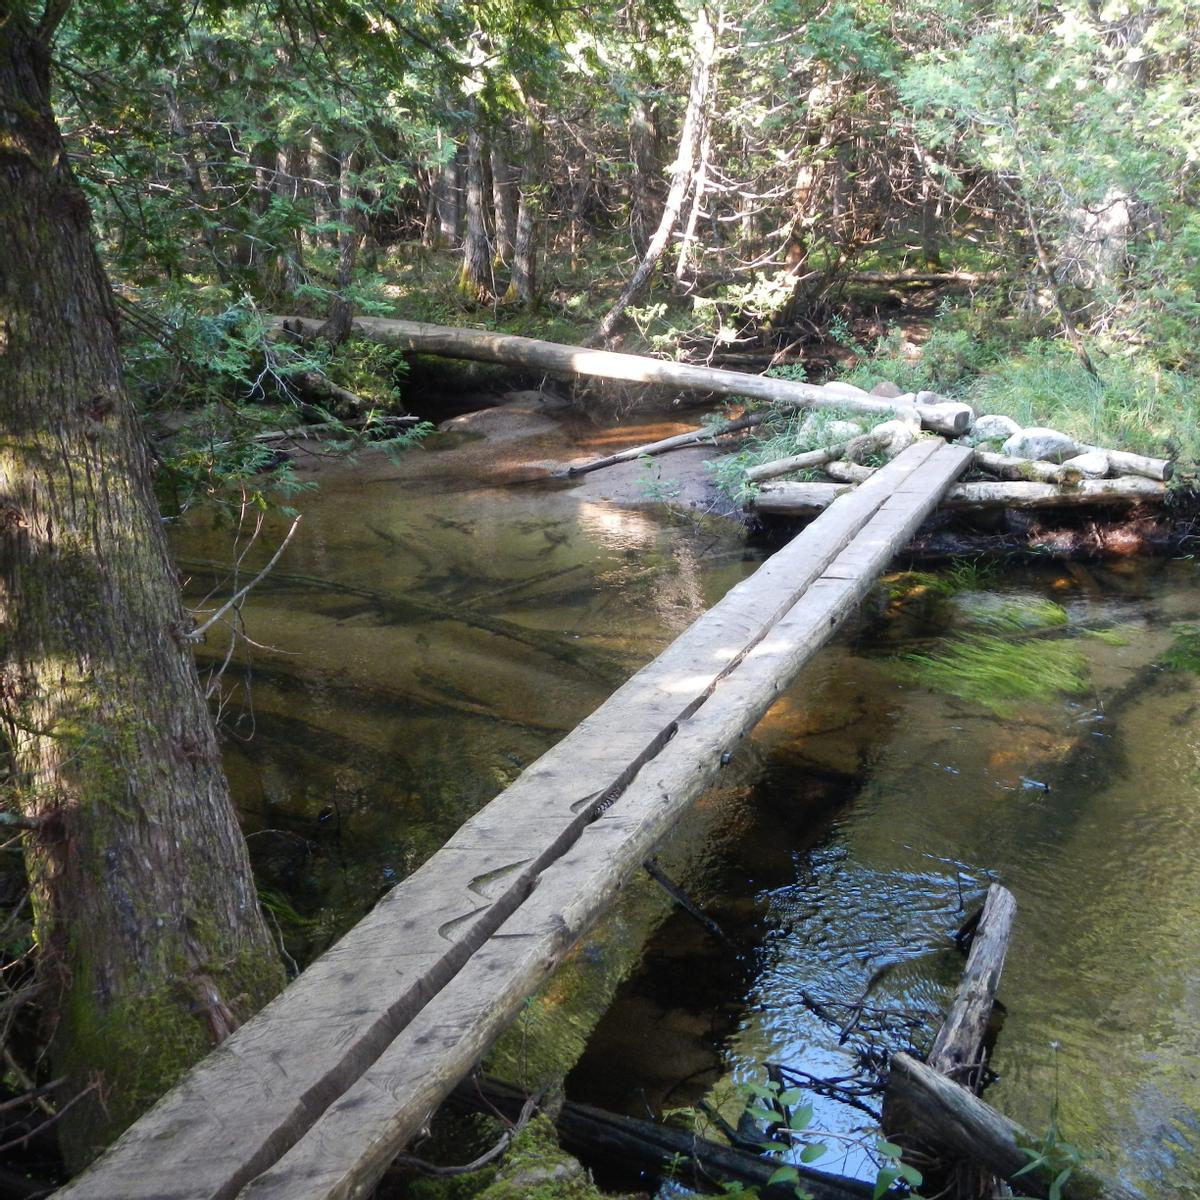 A narrow bridge of two boards crosses a stream